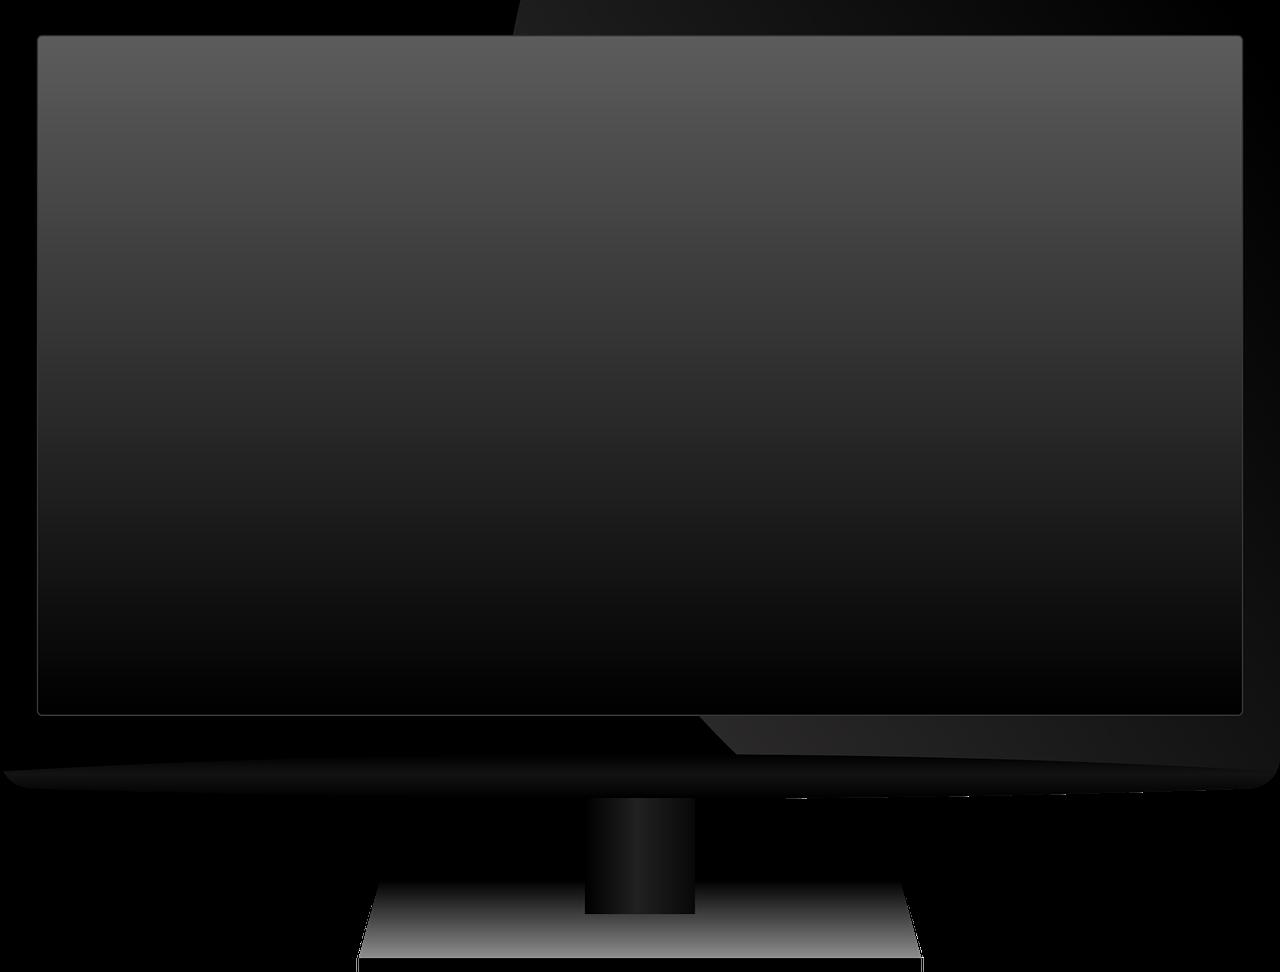 Techniken zur Bildverbesserung bei LCD-Geräten